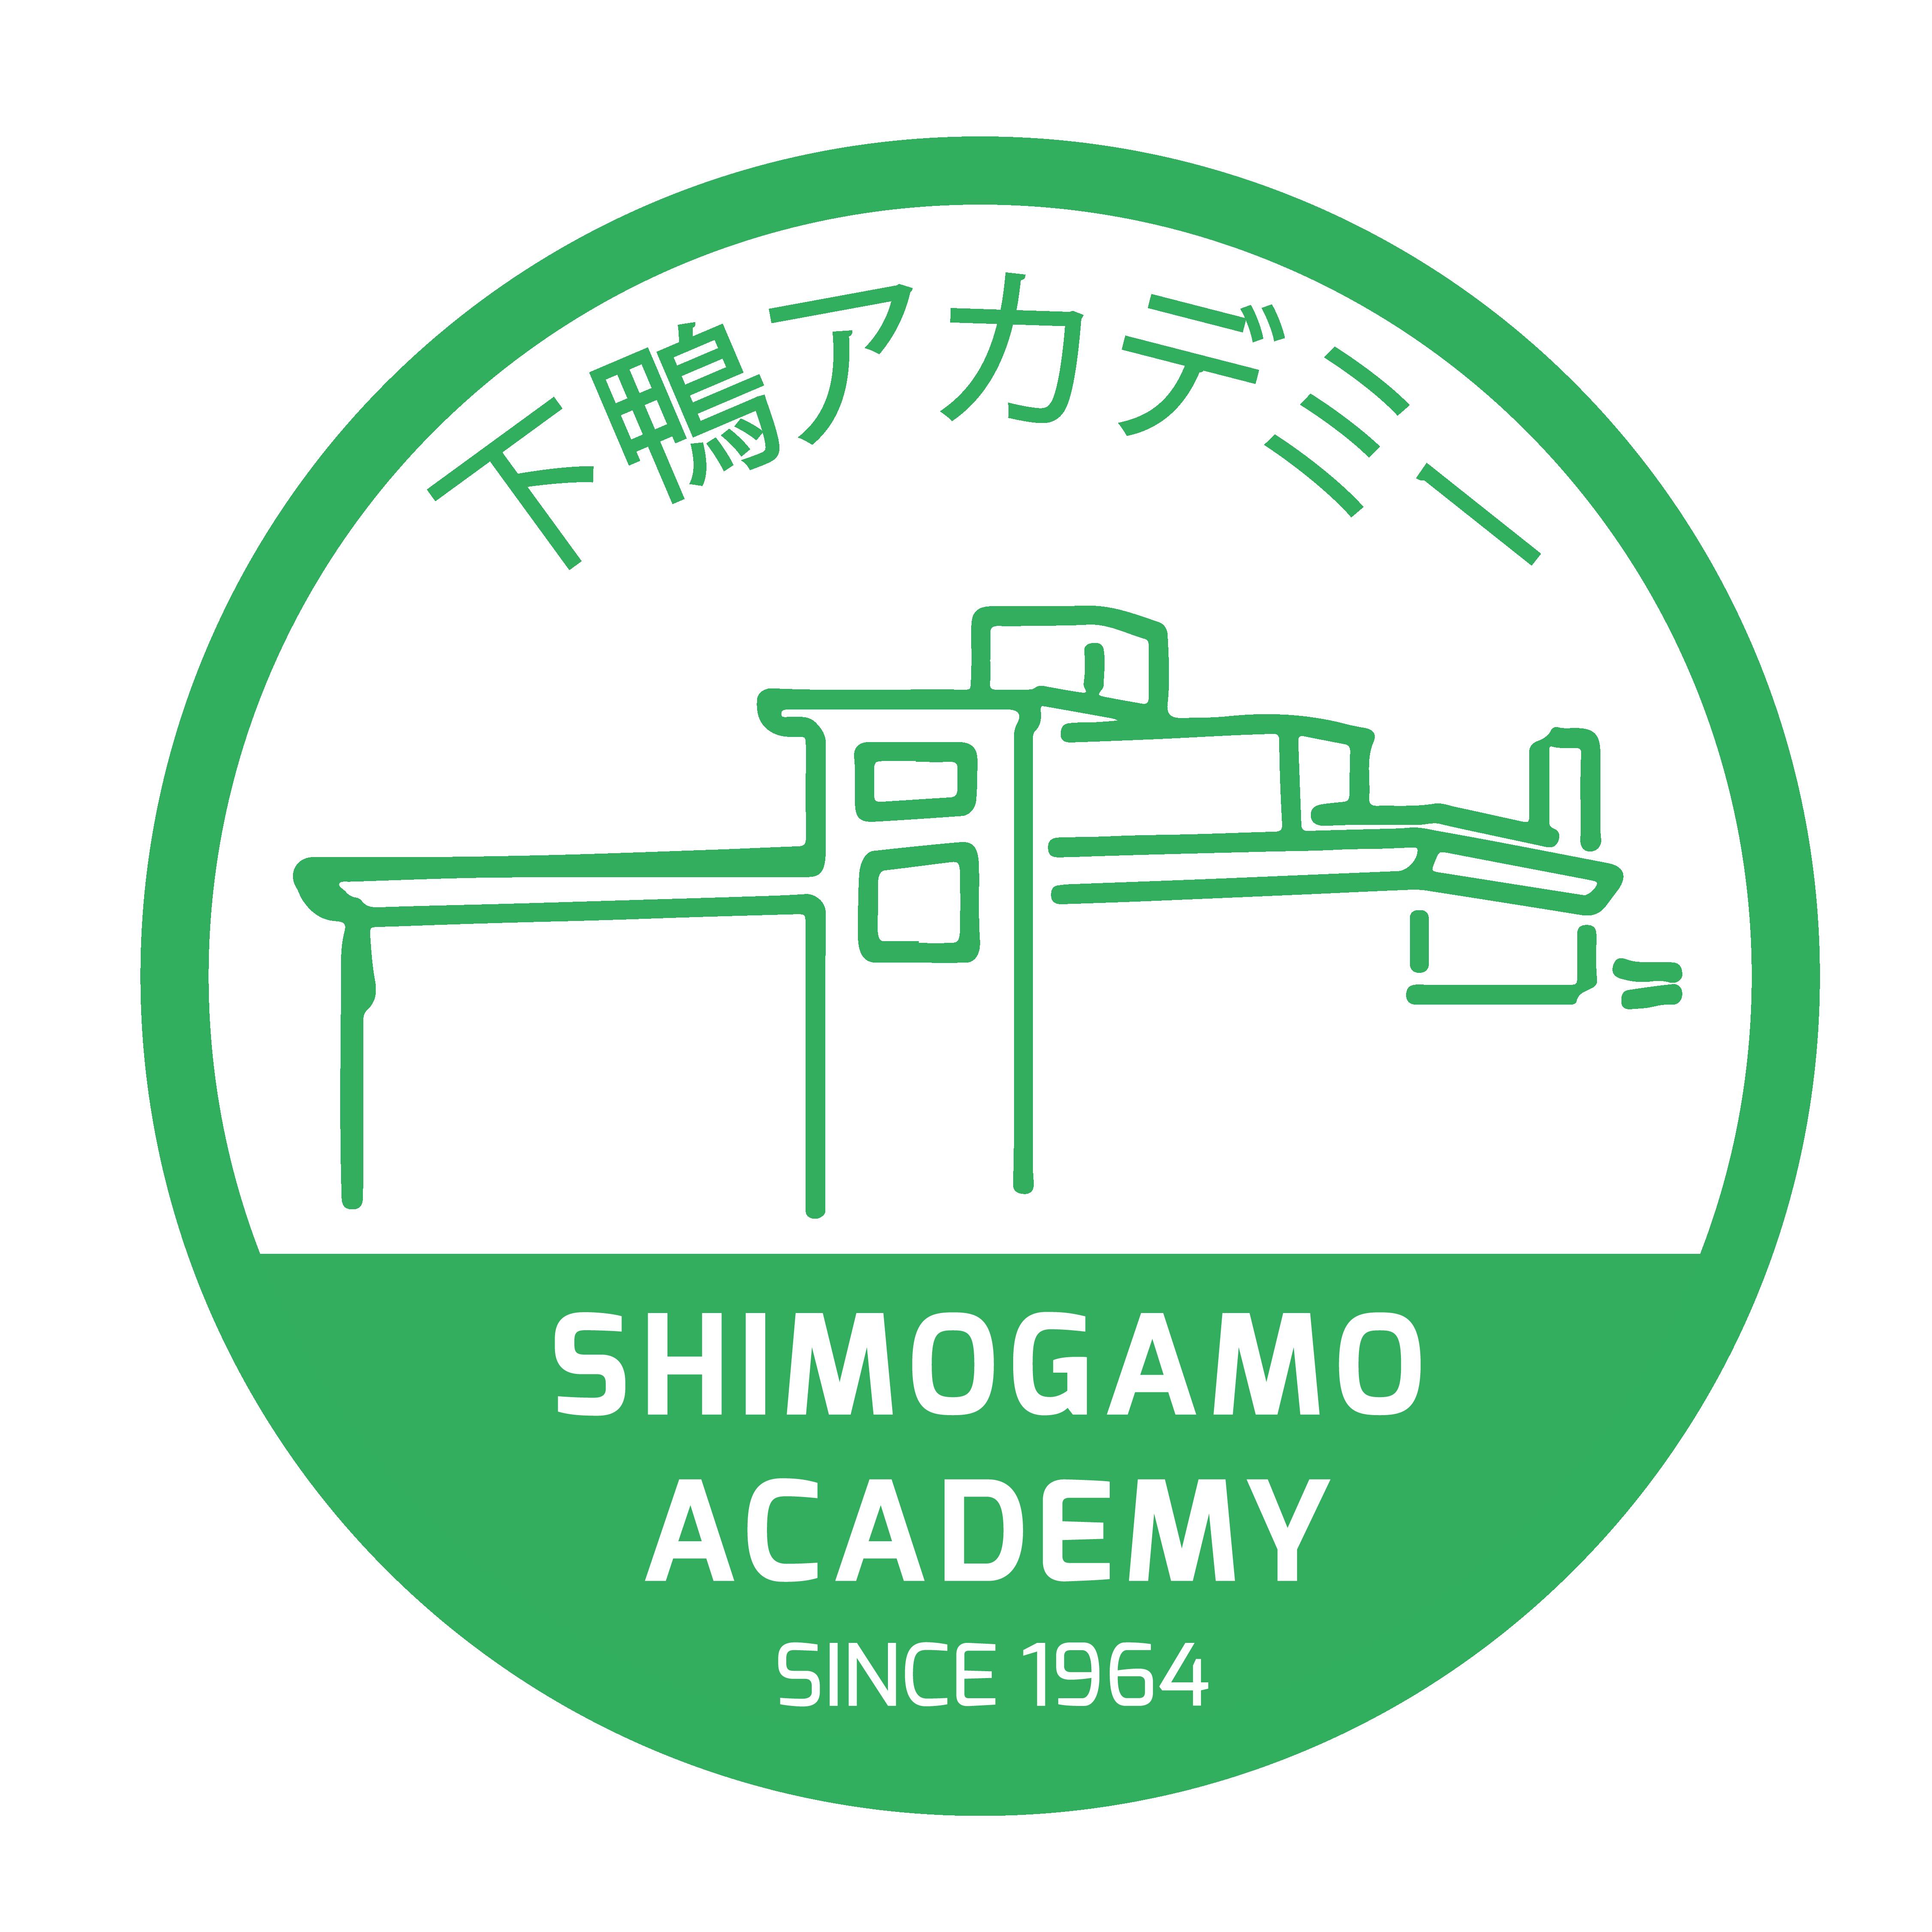 shimogamo_logo_green